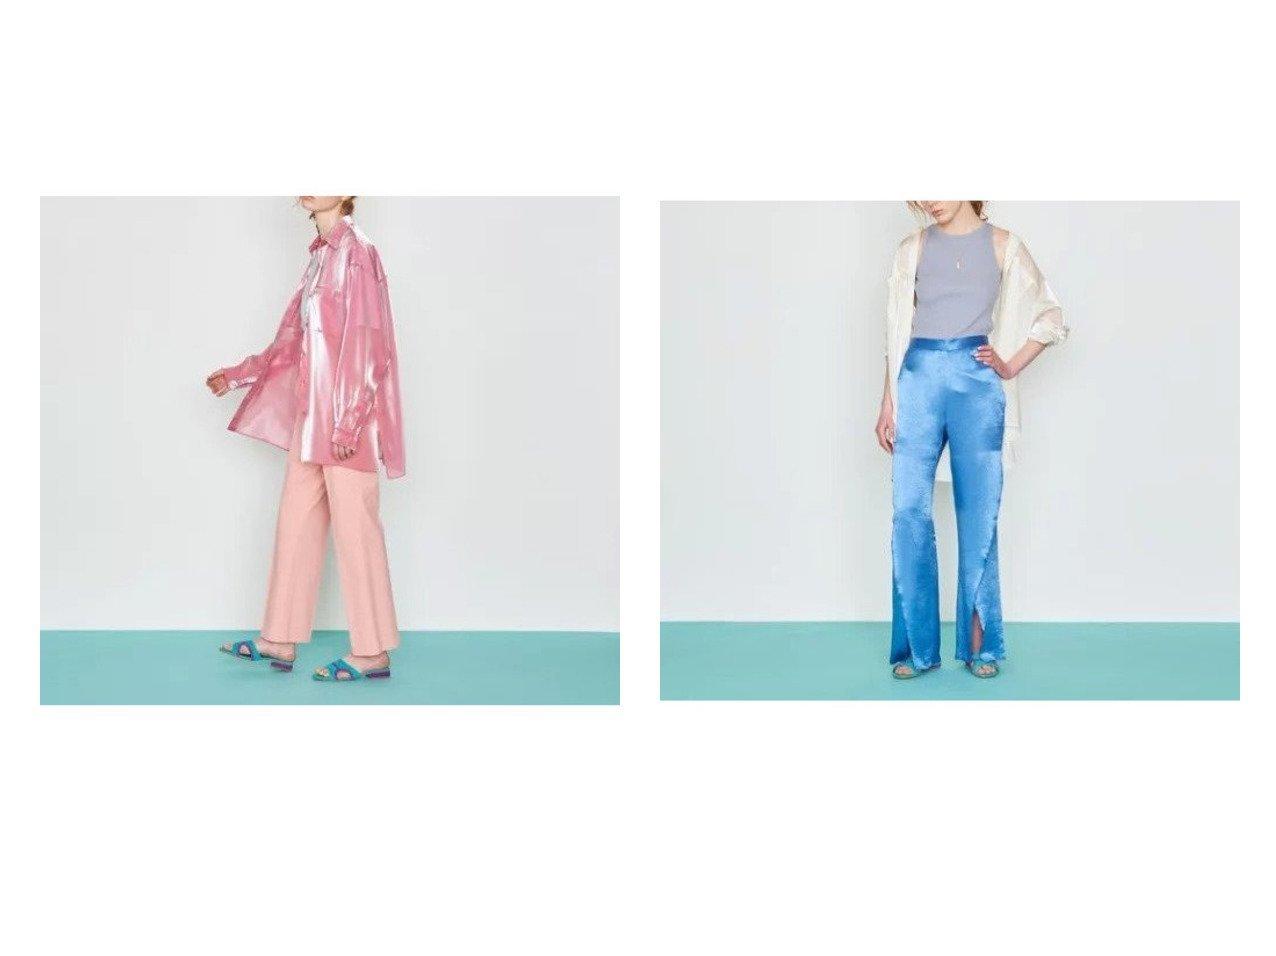 【UNITED ARROWS/ユナイテッドアローズ】のオーガンジー シャツ† 【トップス・カットソー】おすすめ!人気、トレンド・レディースファッションの通販  おすすめで人気の流行・トレンド、ファッションの通販商品 メンズファッション・キッズファッション・インテリア・家具・レディースファッション・服の通販 founy(ファニー) https://founy.com/ ファッション Fashion レディースファッション WOMEN トップス・カットソー Tops/Tshirt シャツ/ブラウス Shirts/Blouses オーガンジー ダブル ドローストリング ビッグ ポケット メタリック リラックス 長袖 |ID:crp329100000033377